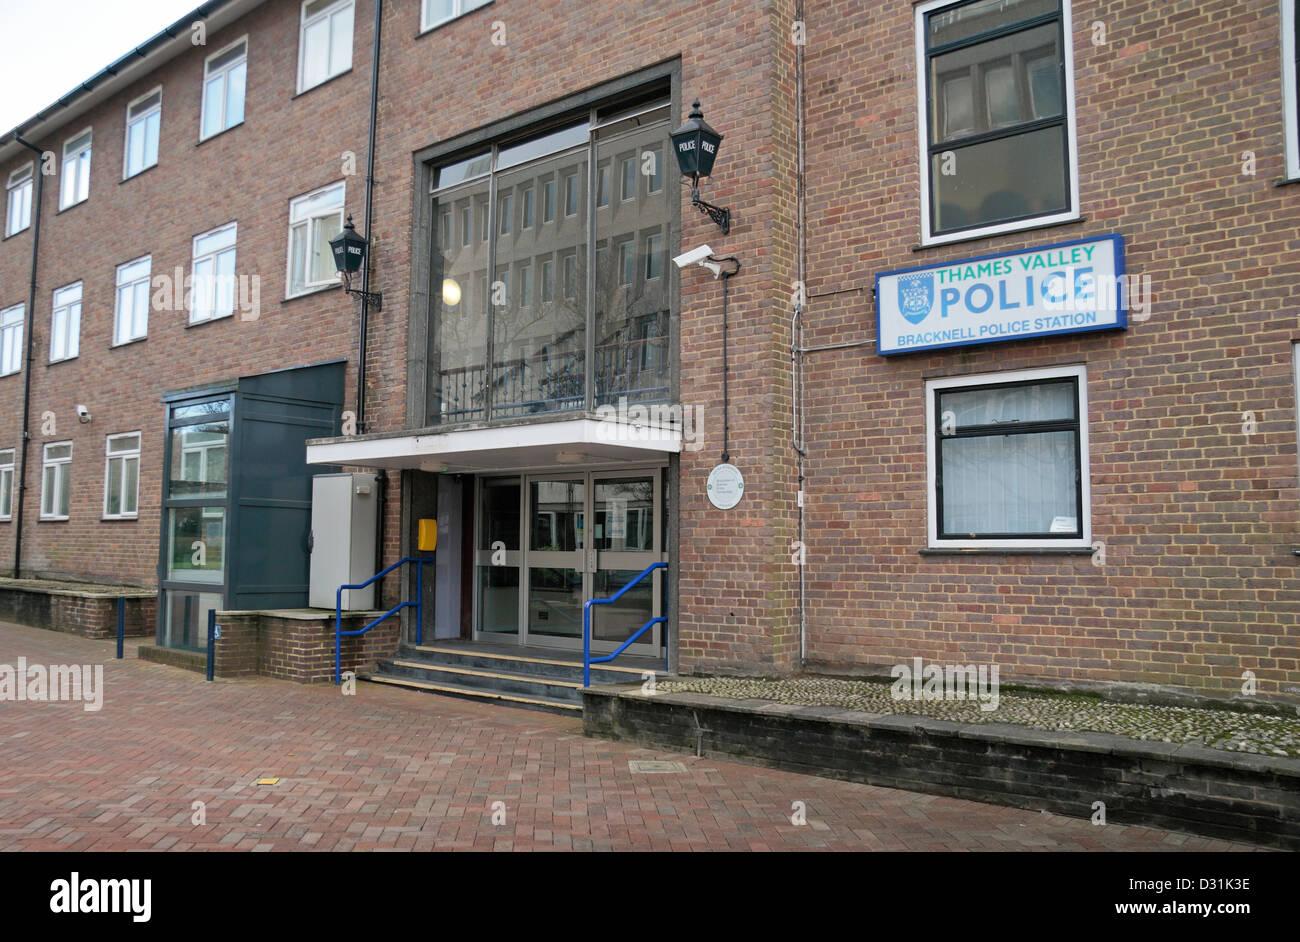 Bracknell Police Station (Thames Valley Police), The Broadway, Bracknell, Berkshire, RG12 1AD UK. - Stock Image